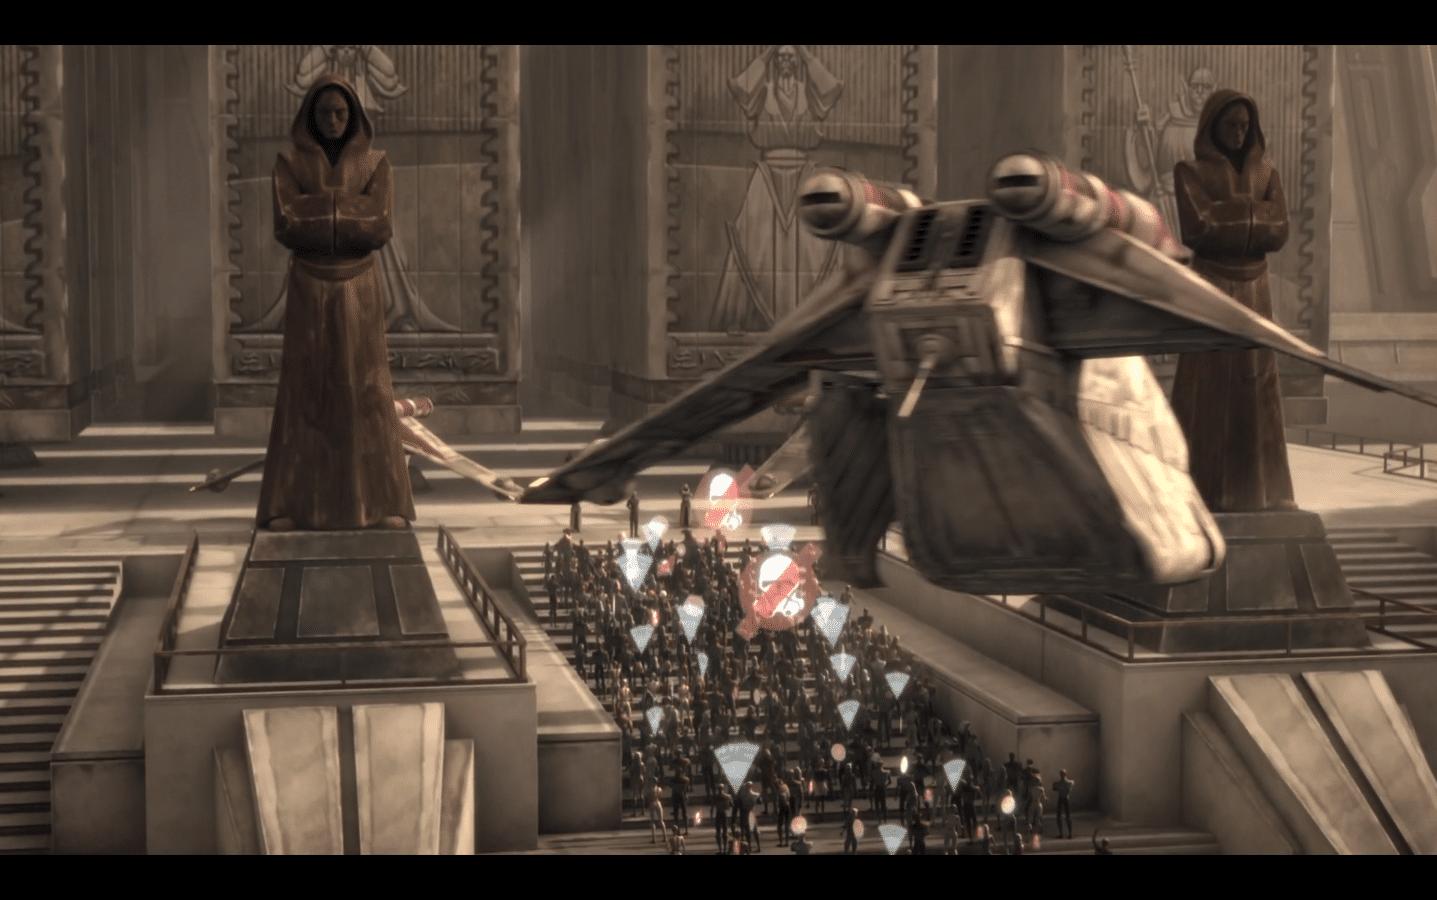 Jedi Temple Protest